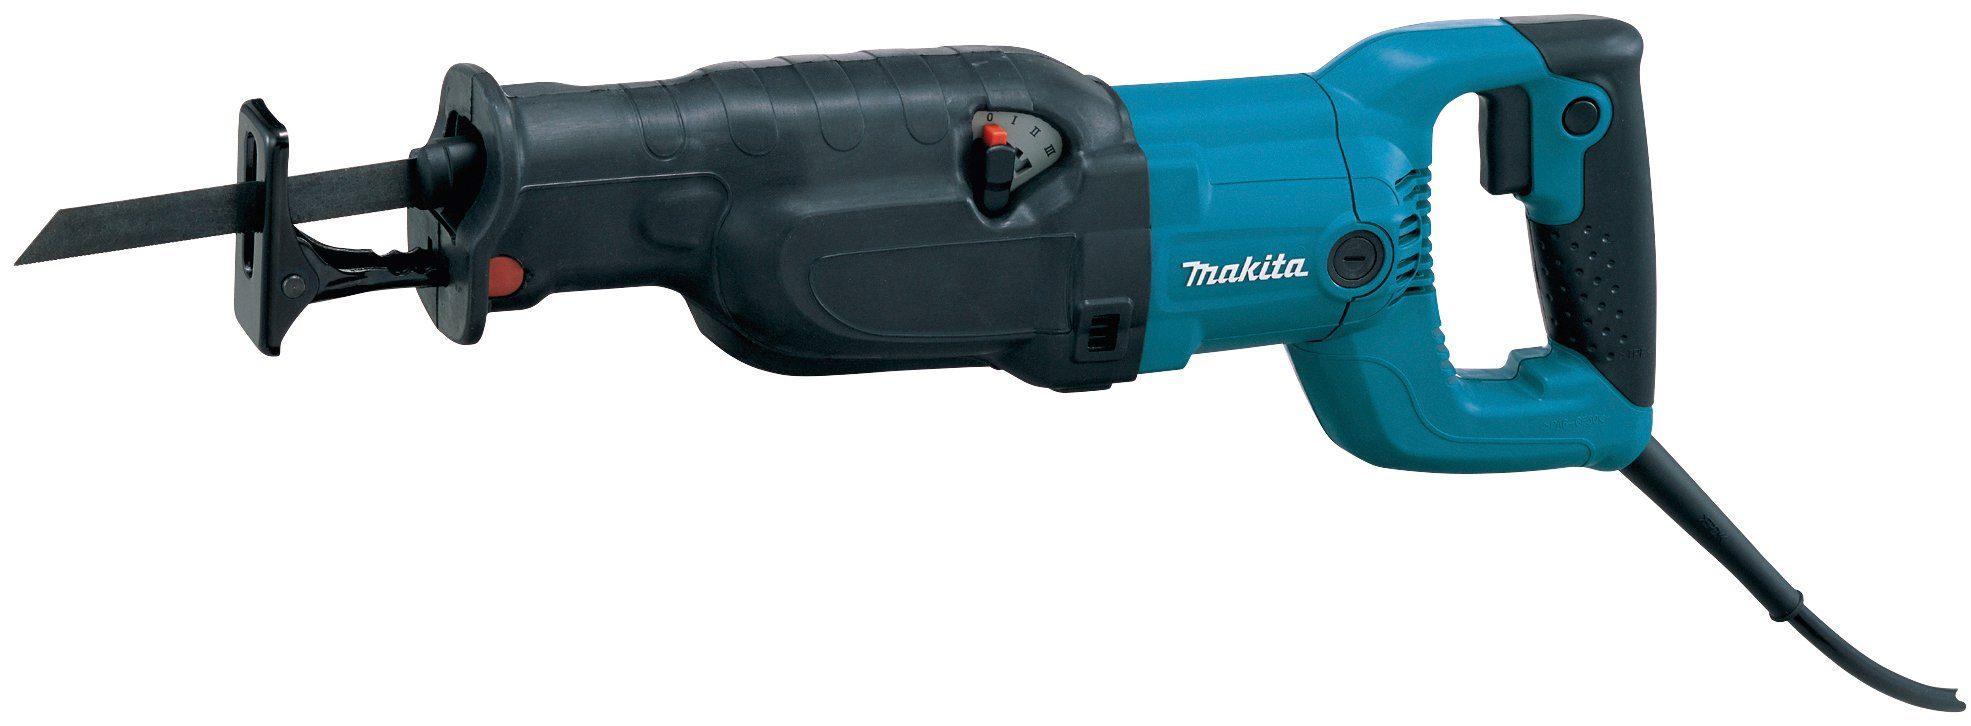 MAKITA Reciprosäge »JR3060T«, 1250 W